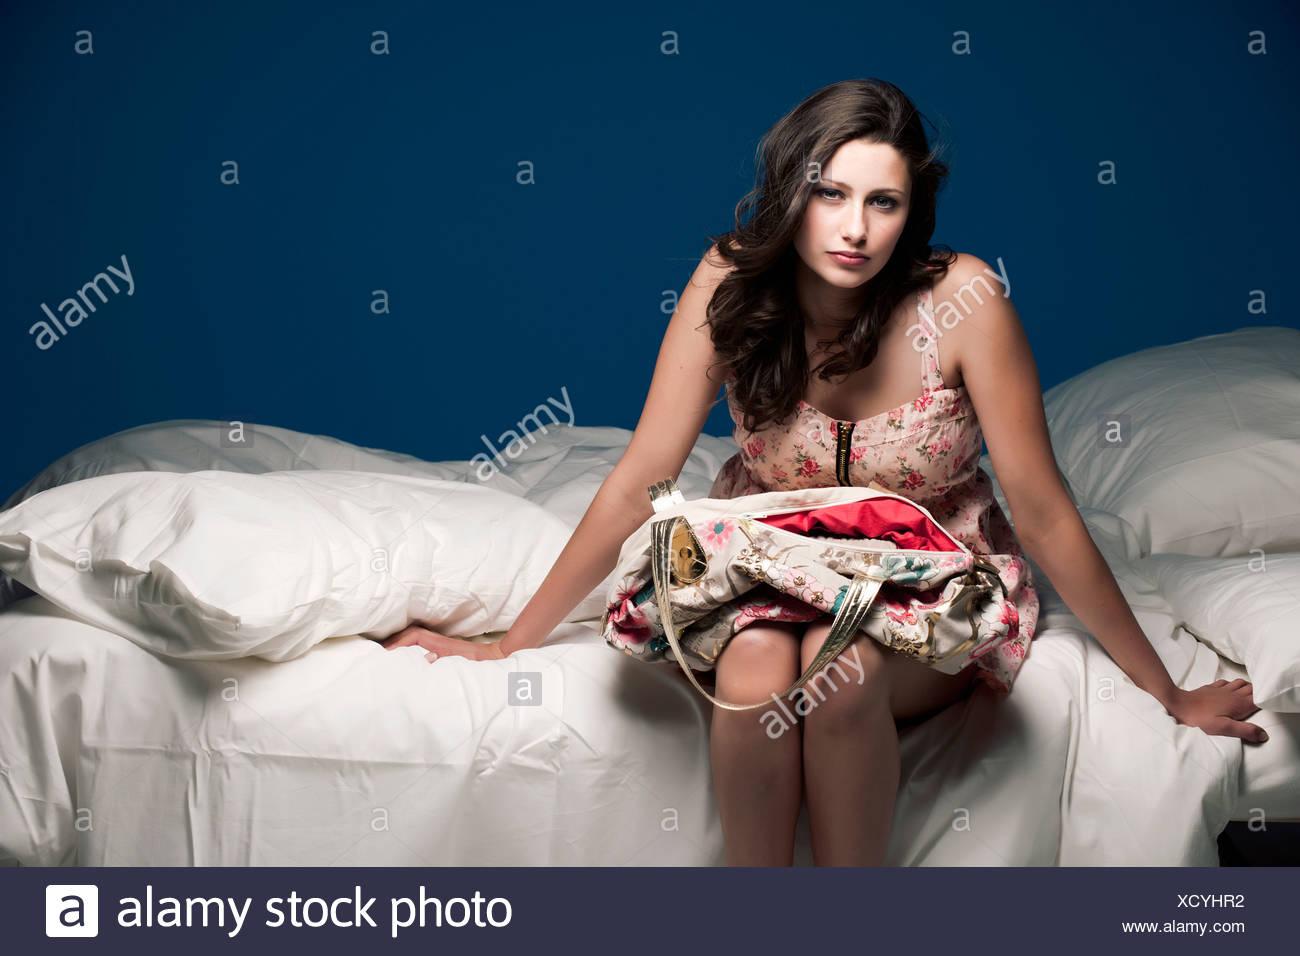 Teenager-Mädchen Bett Geldbörse festhalten Stockbild